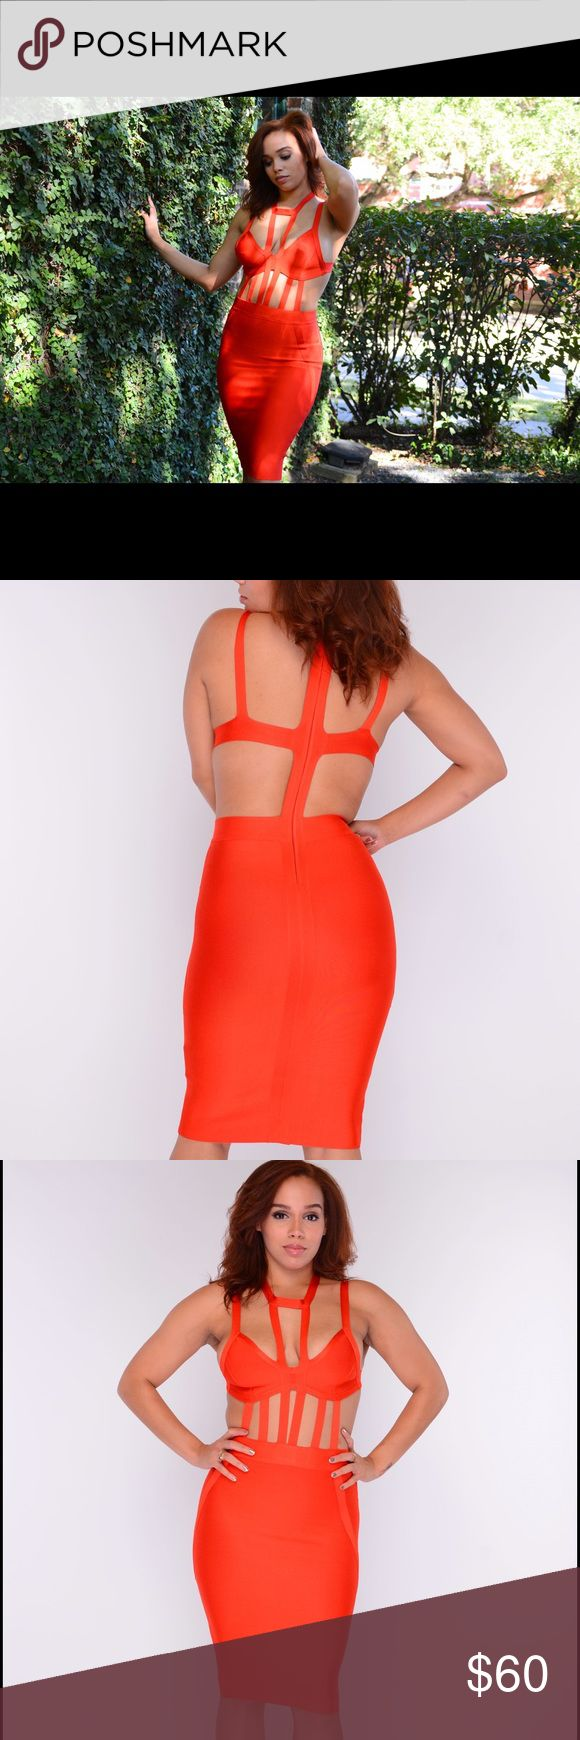 Red Bandage Dress High Quality Red Bandage Cage Dress. Dresses Midi